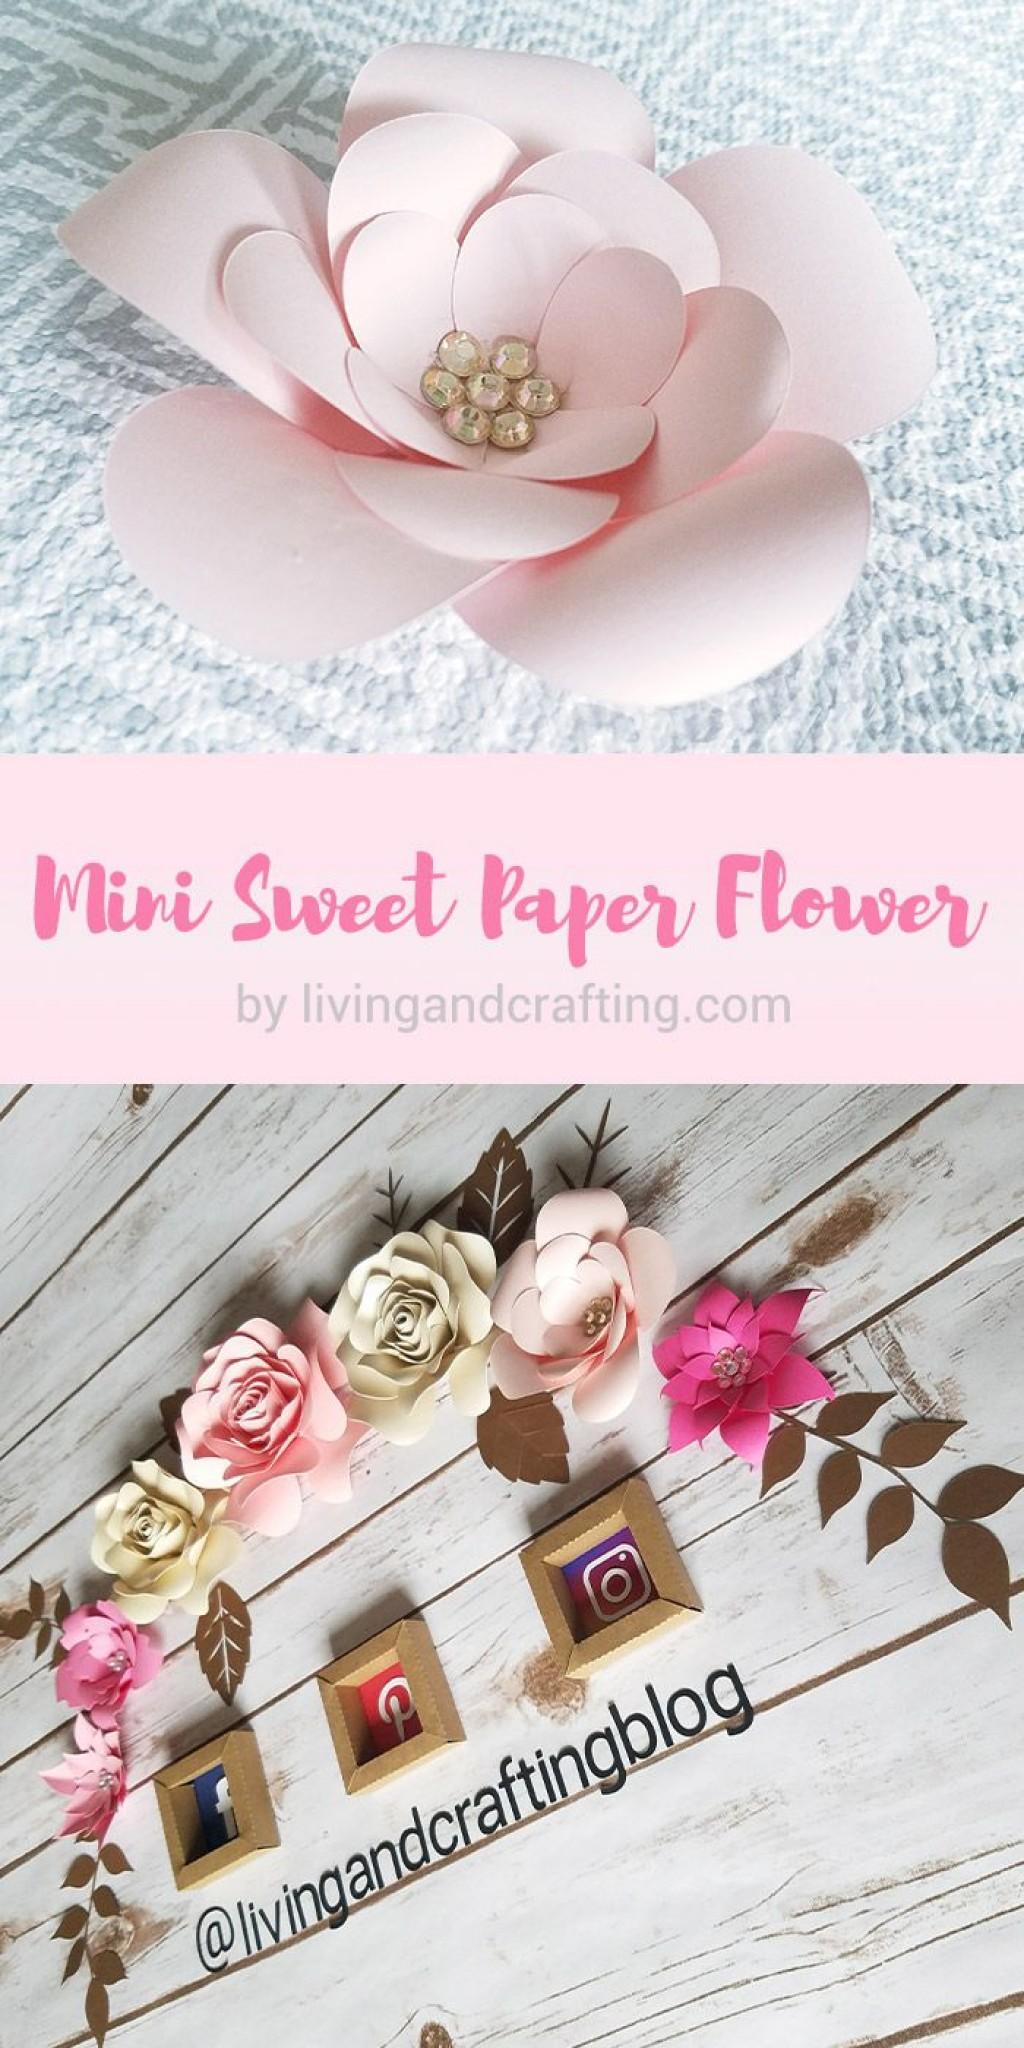 009 Surprising Paper Flower Template Free Sample  Rolled Svg Rose Cricut PdfLarge